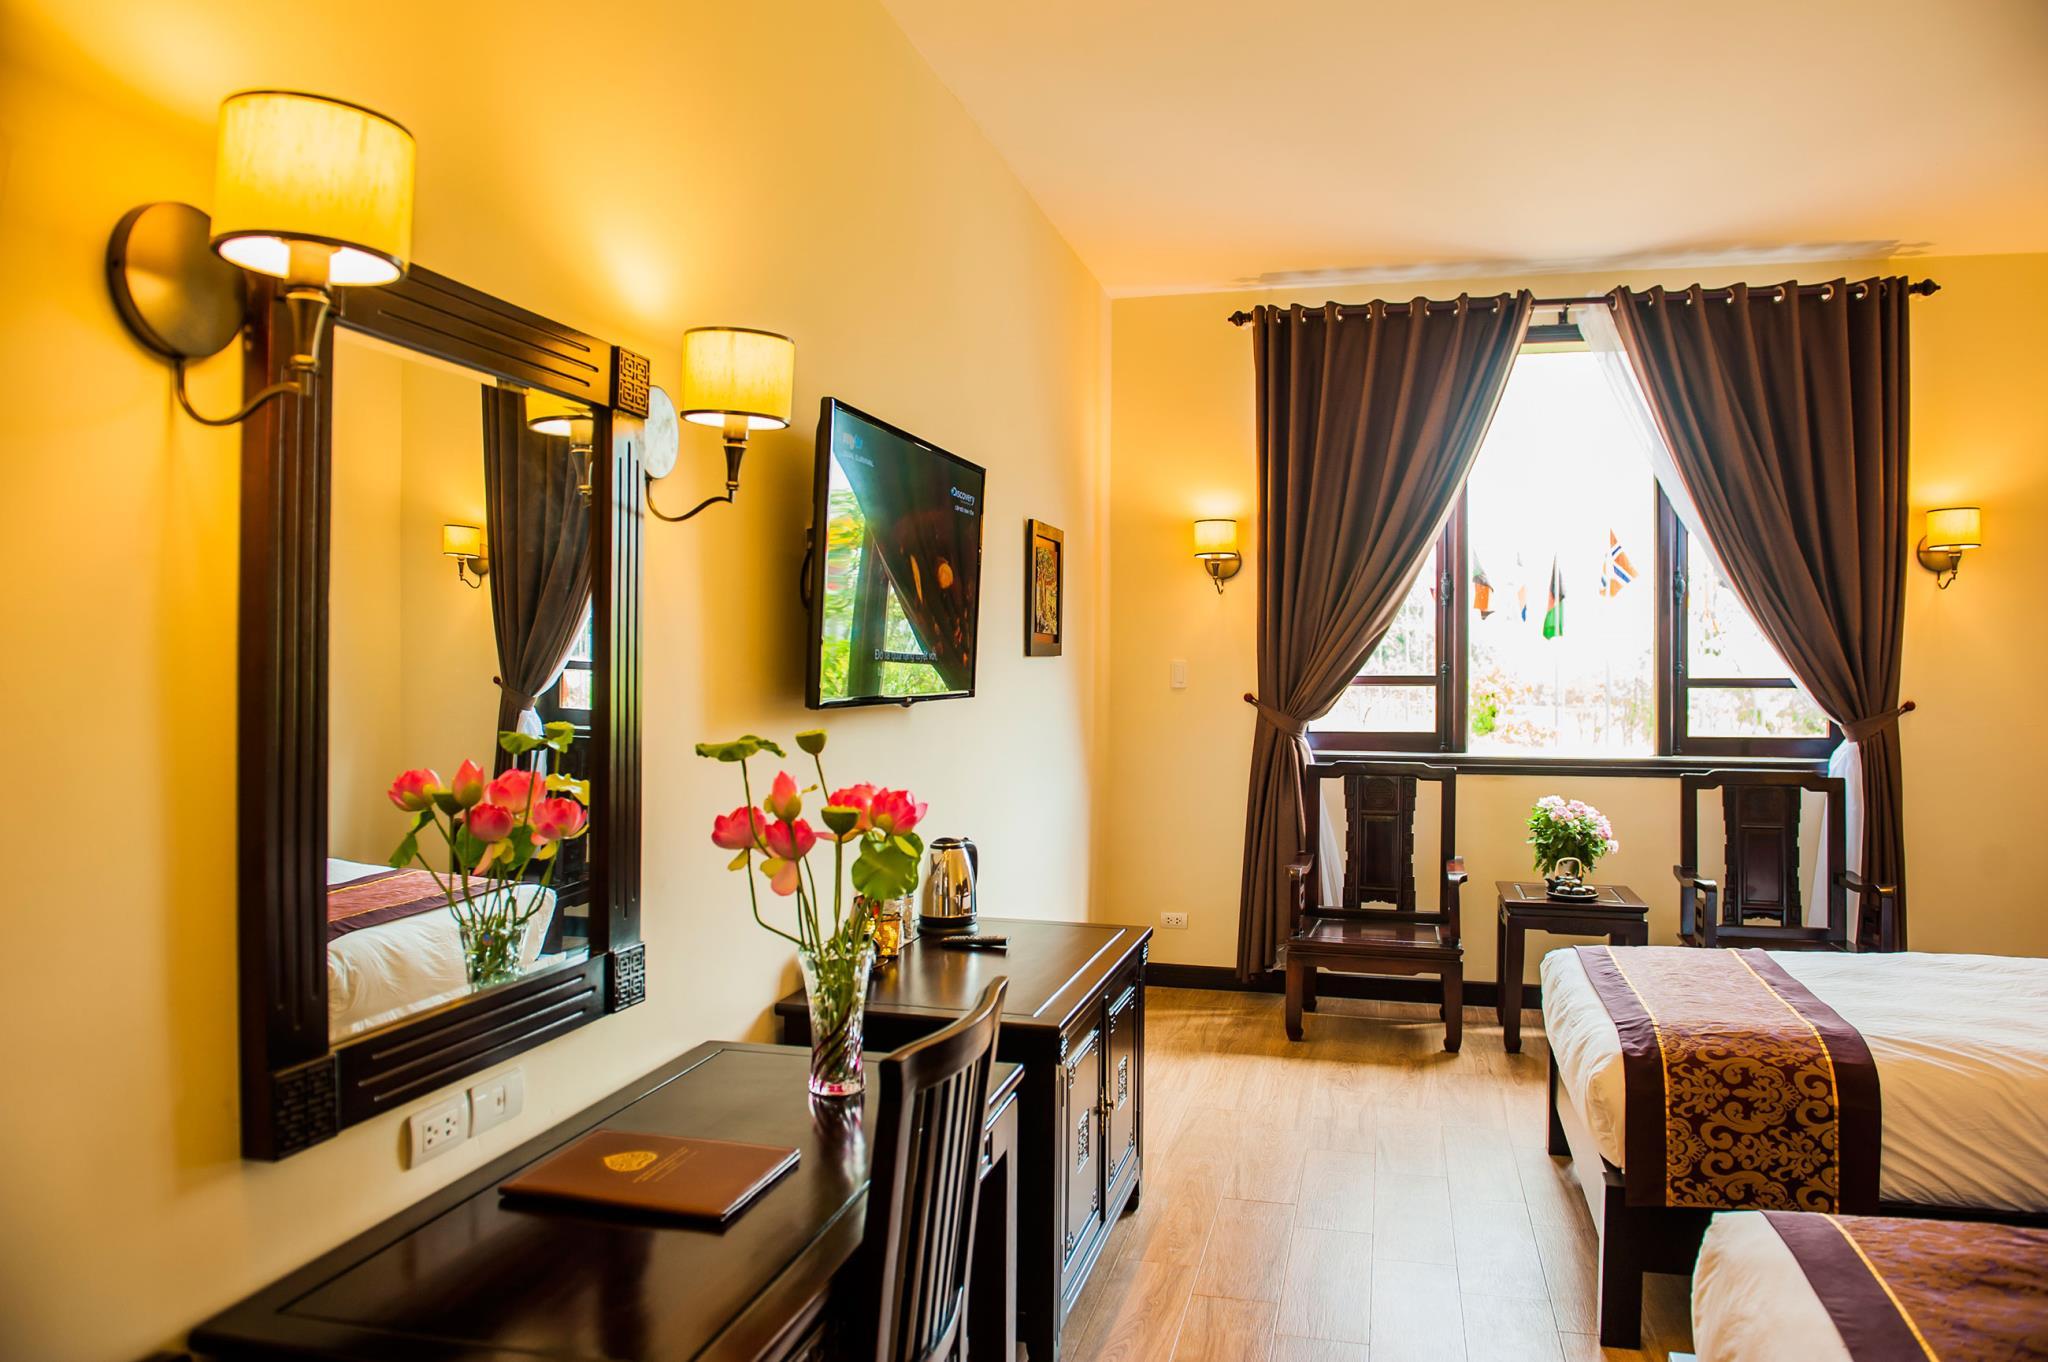 Bái Đính Hotel & Restaurant